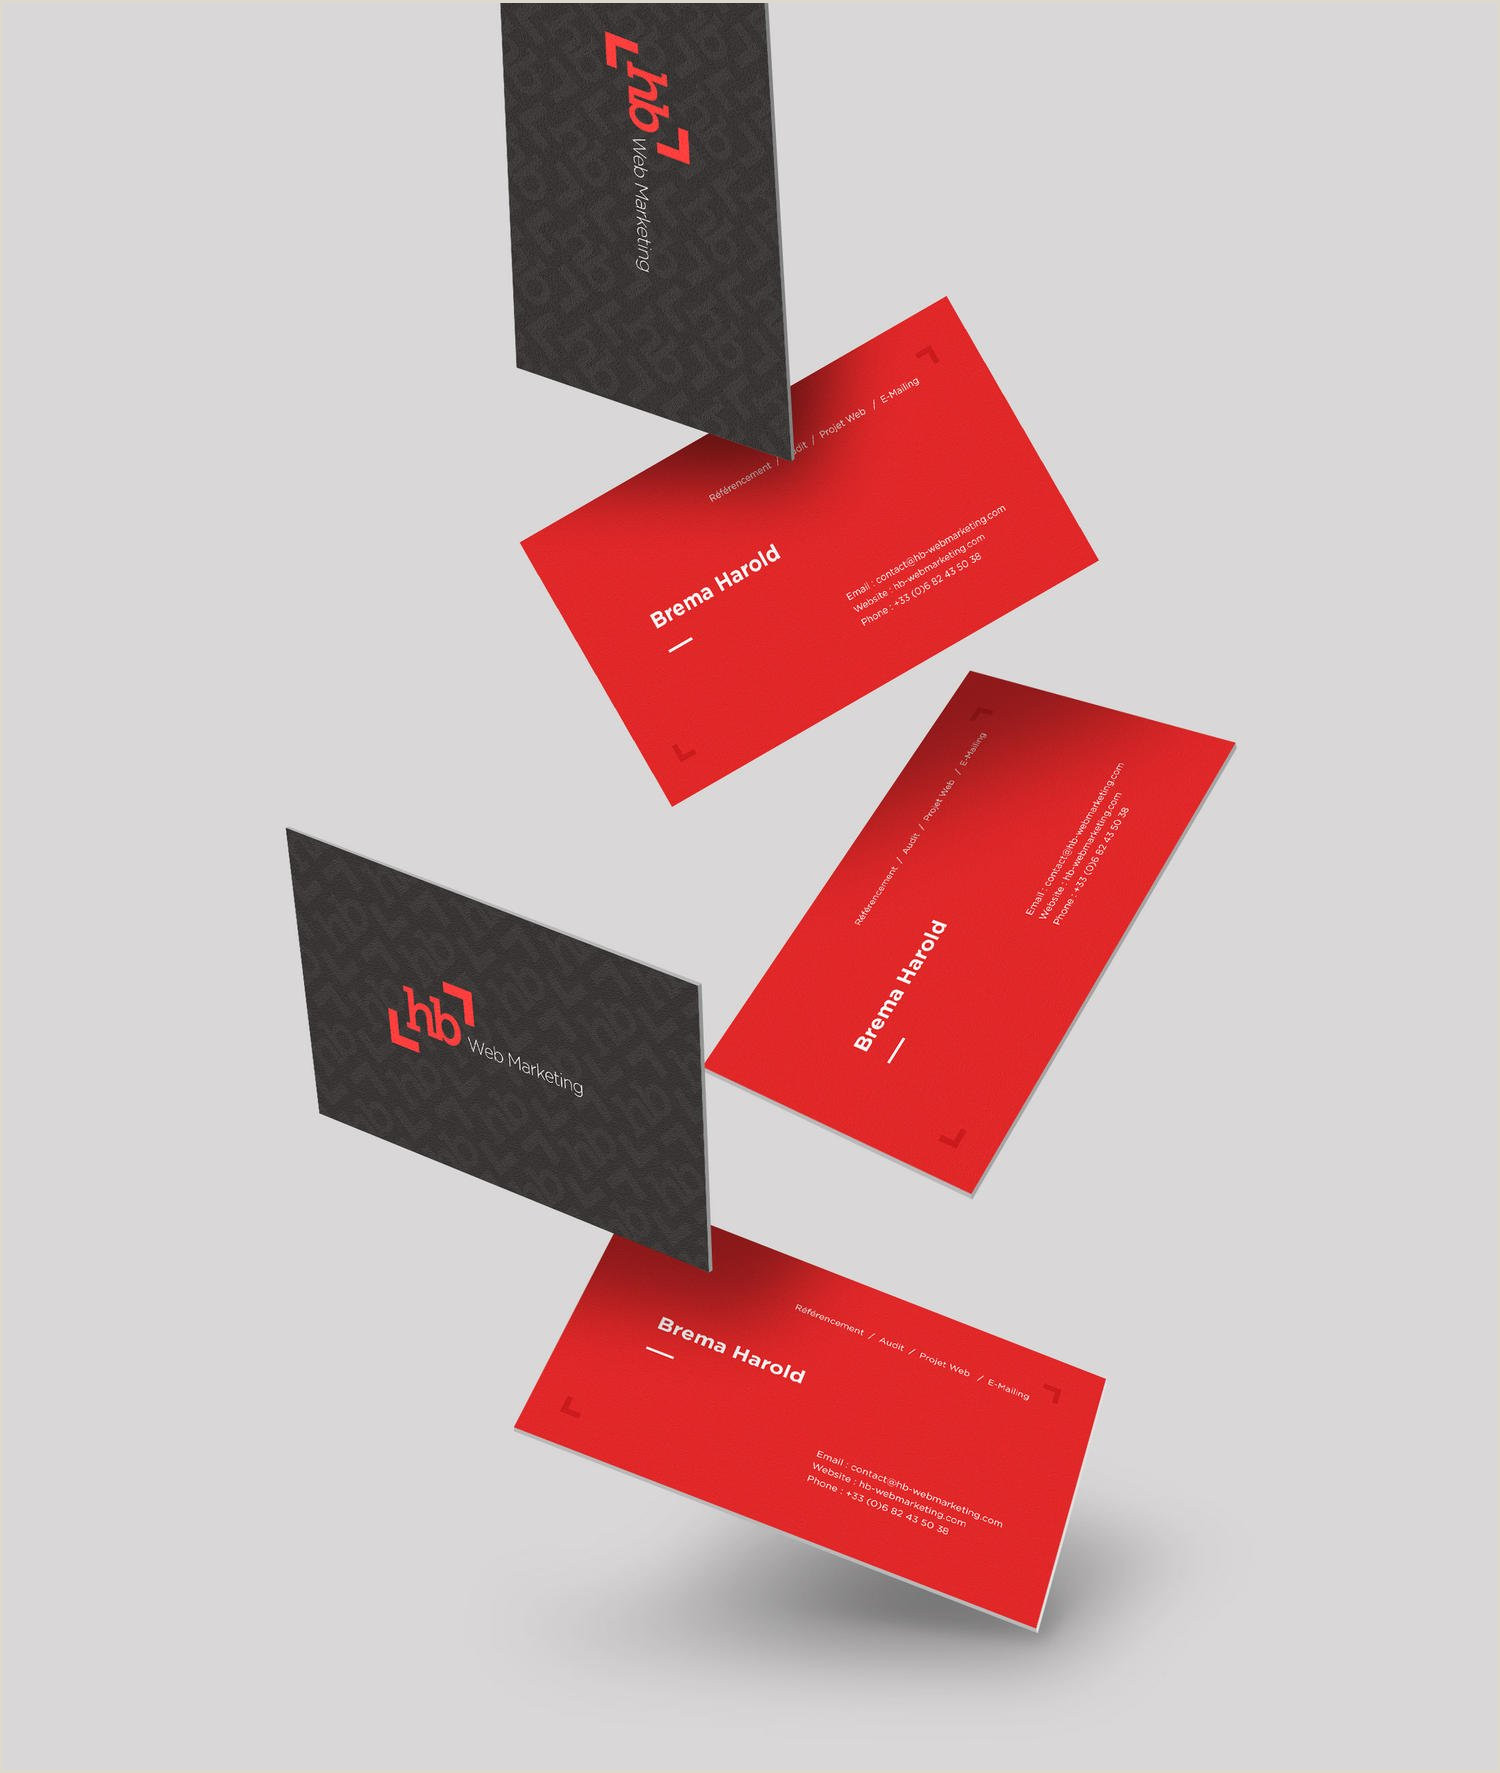 Designing Business Card Business Card Design By Alanaragondesign On Envato Studio